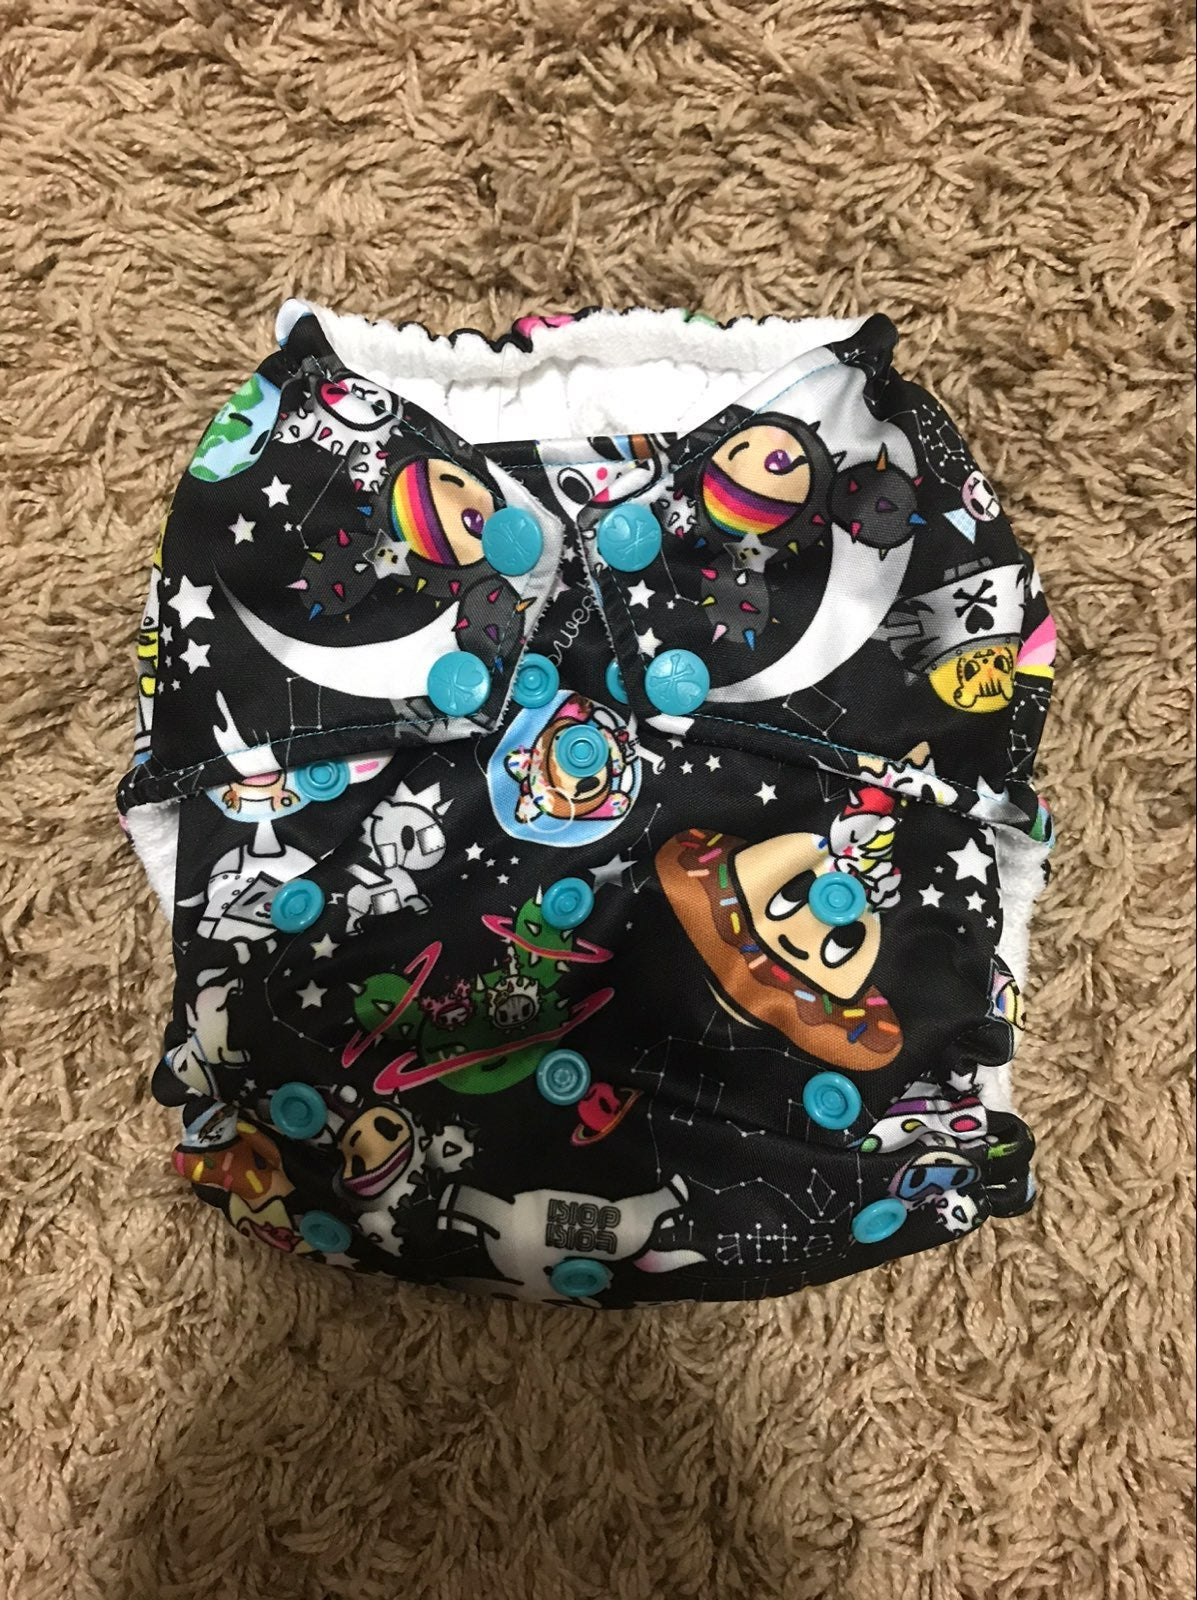 TokiSpace cloth diaper